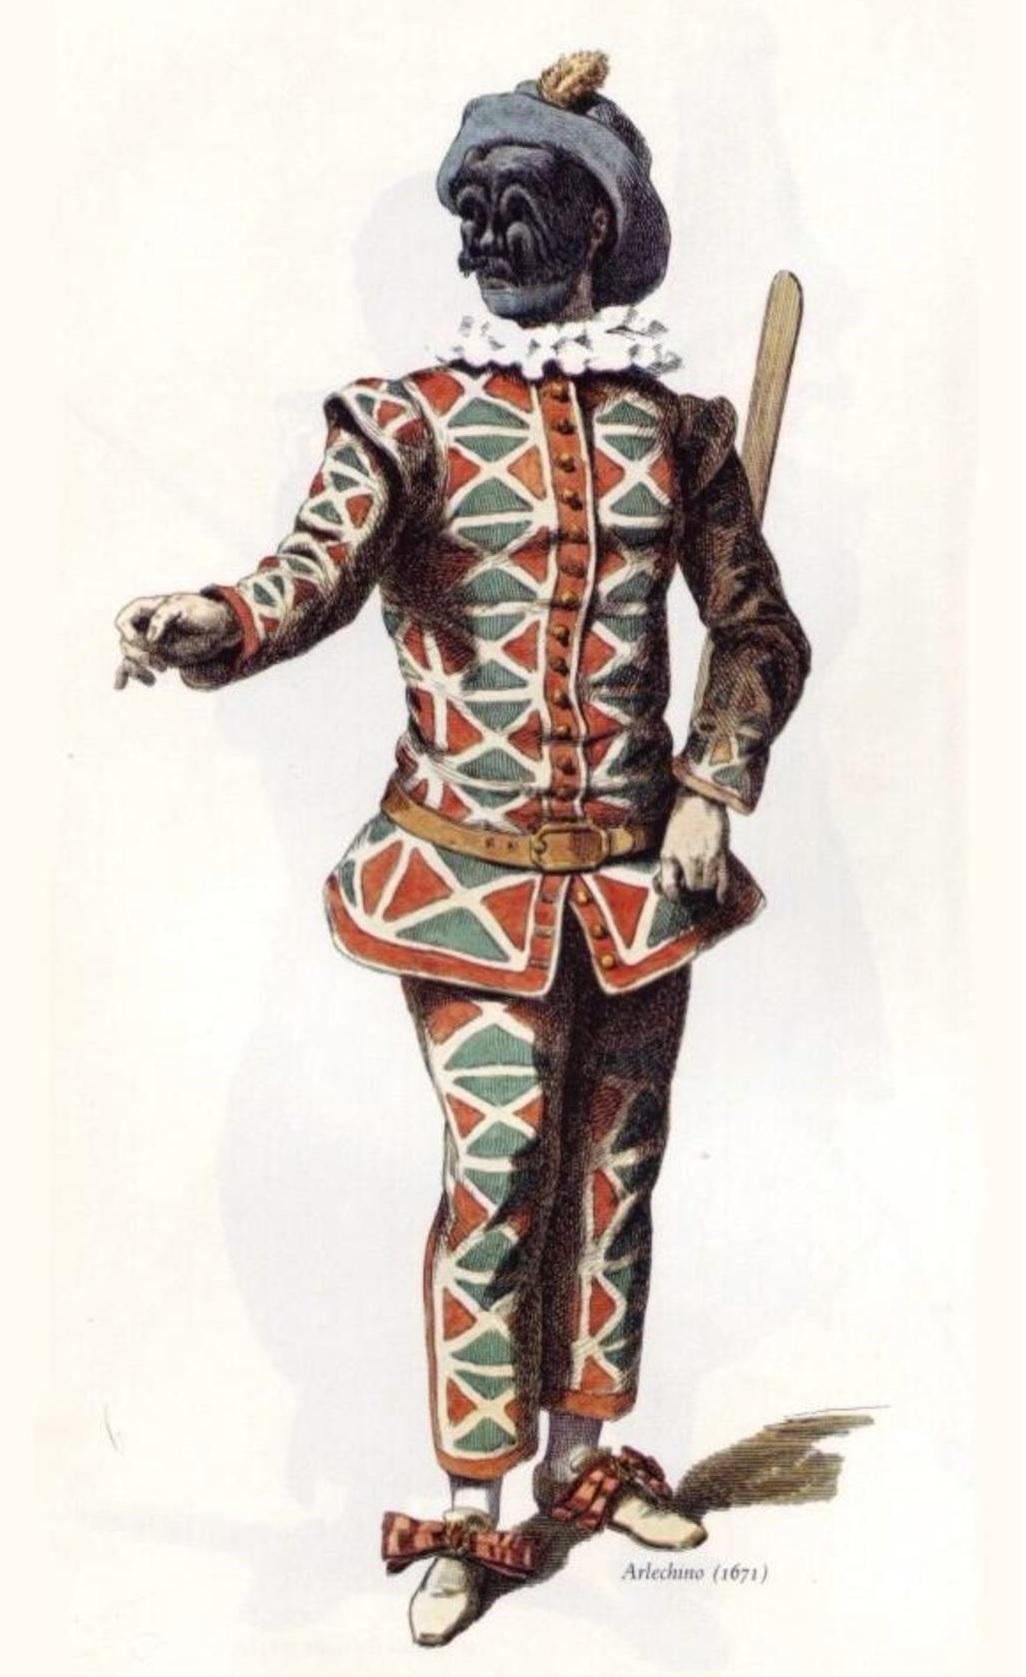 harlekin kostume historisk